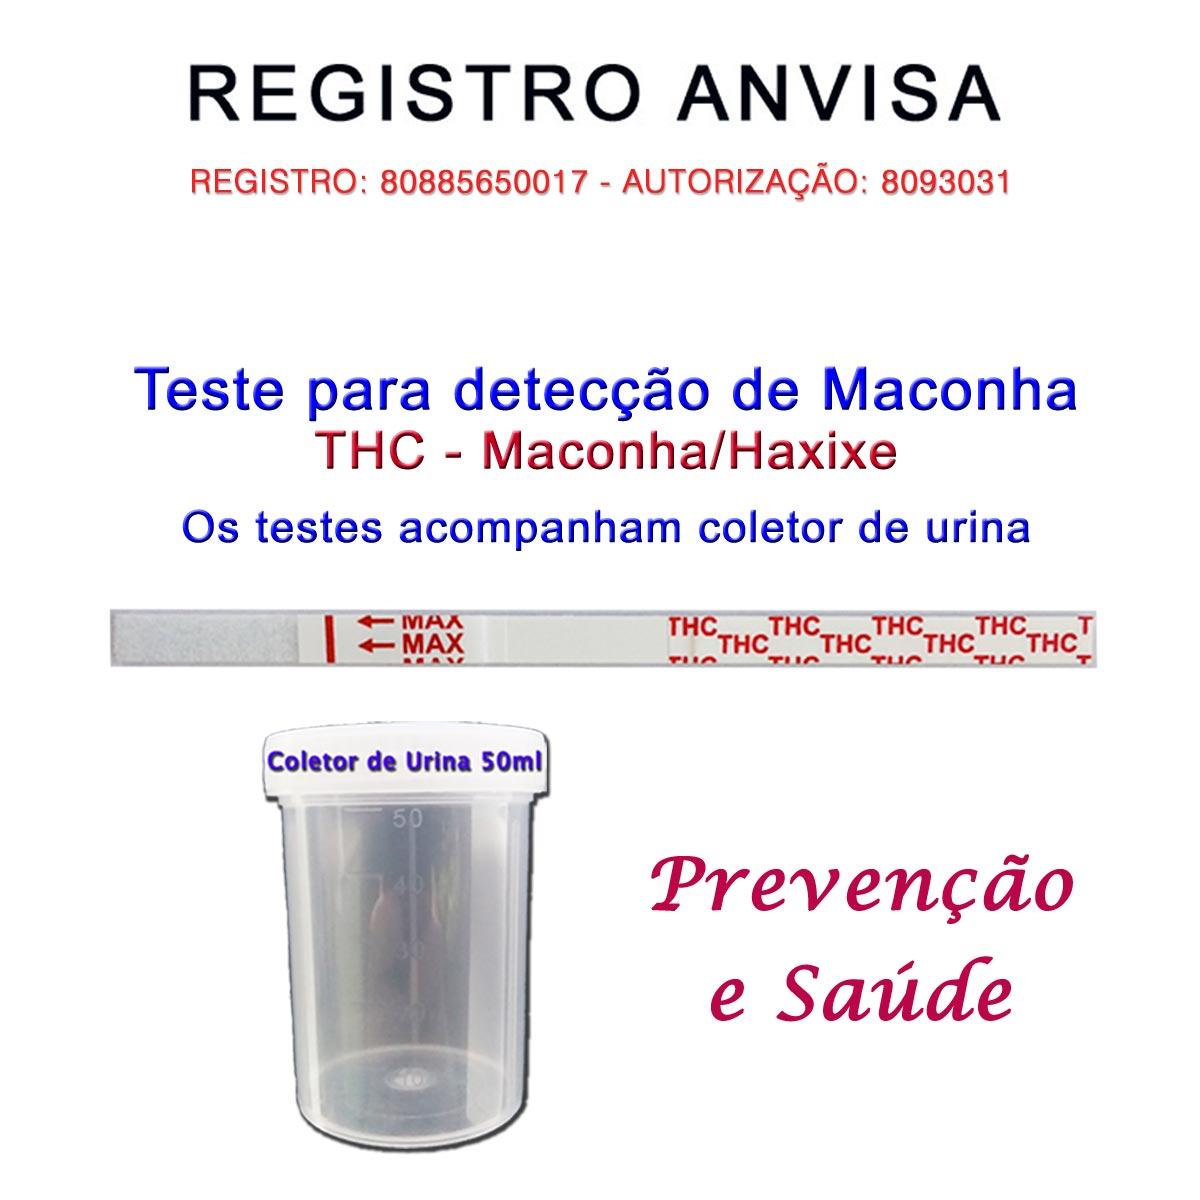 05 Kits para testes de THC  - Loja Saúde - Diagnósticos e Produtos Naturais